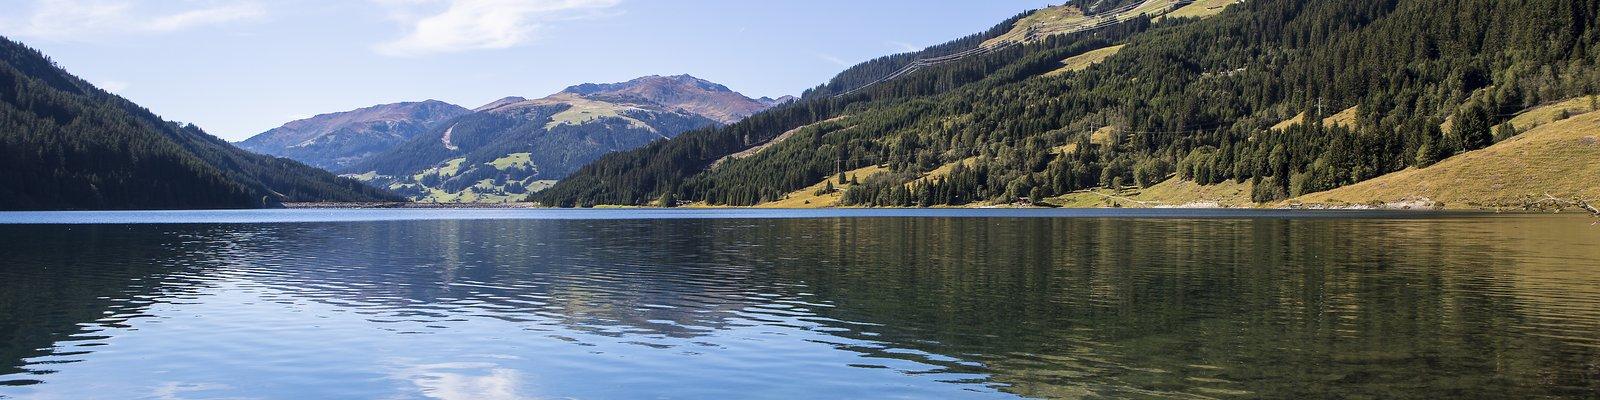 View of the Durlassboden reservoir ©Johannes Sautner (Zillertal Arena)